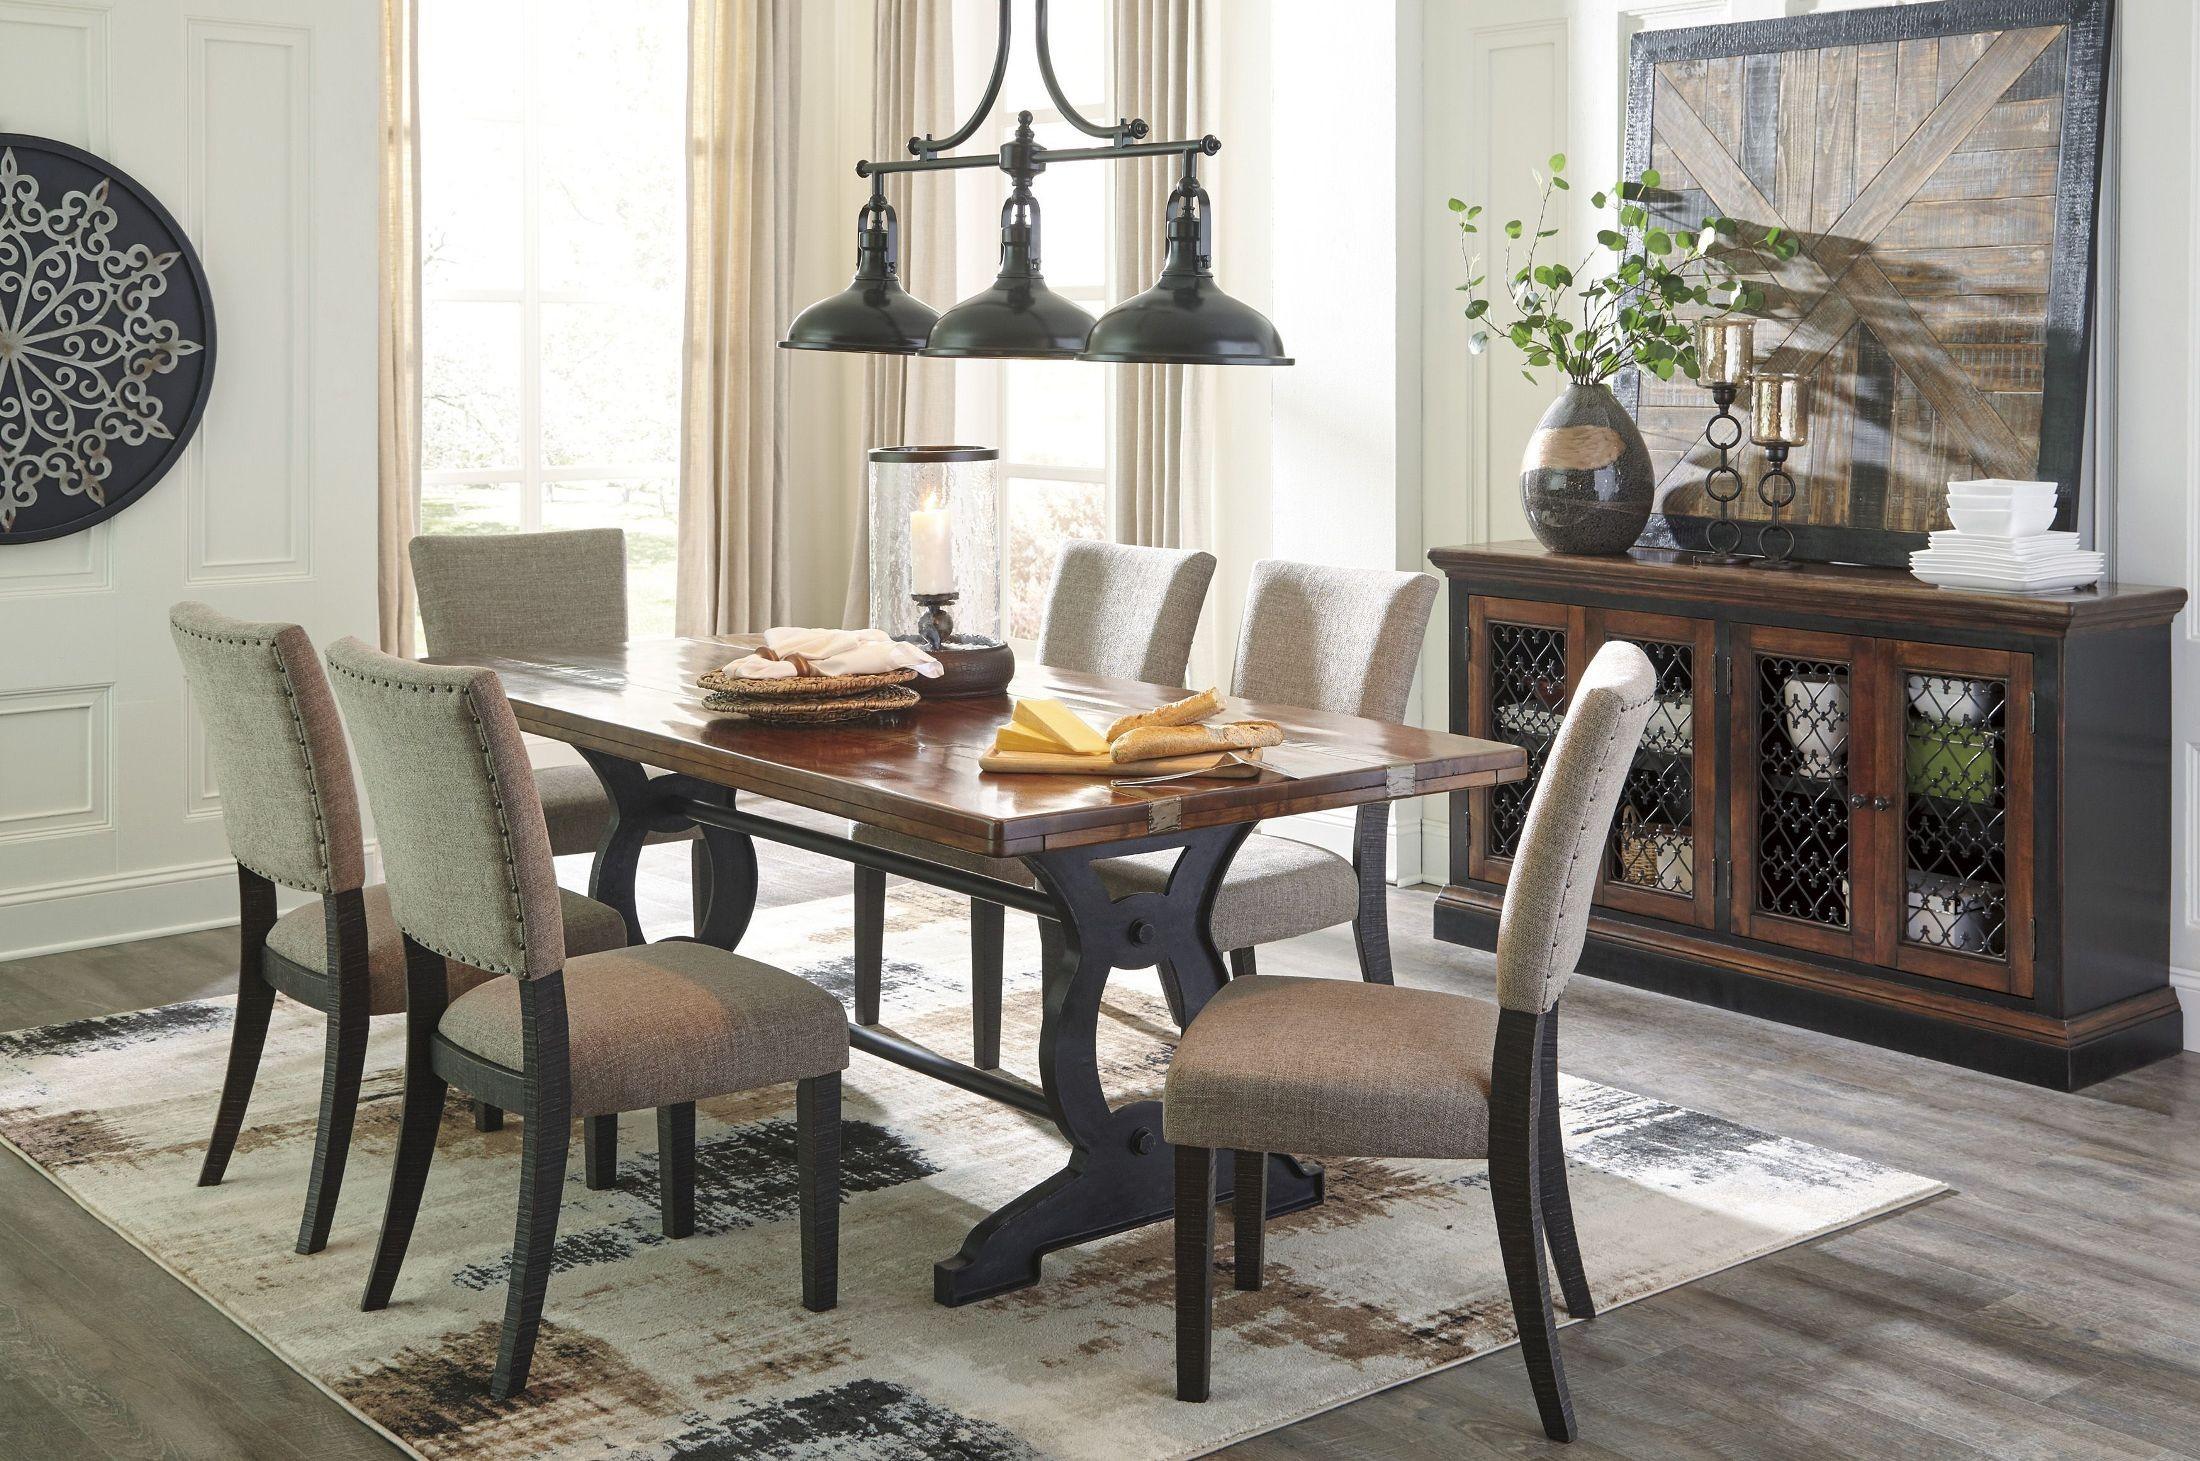 zurani brown and black rectangular dining table d709 25 ashley. Black Bedroom Furniture Sets. Home Design Ideas